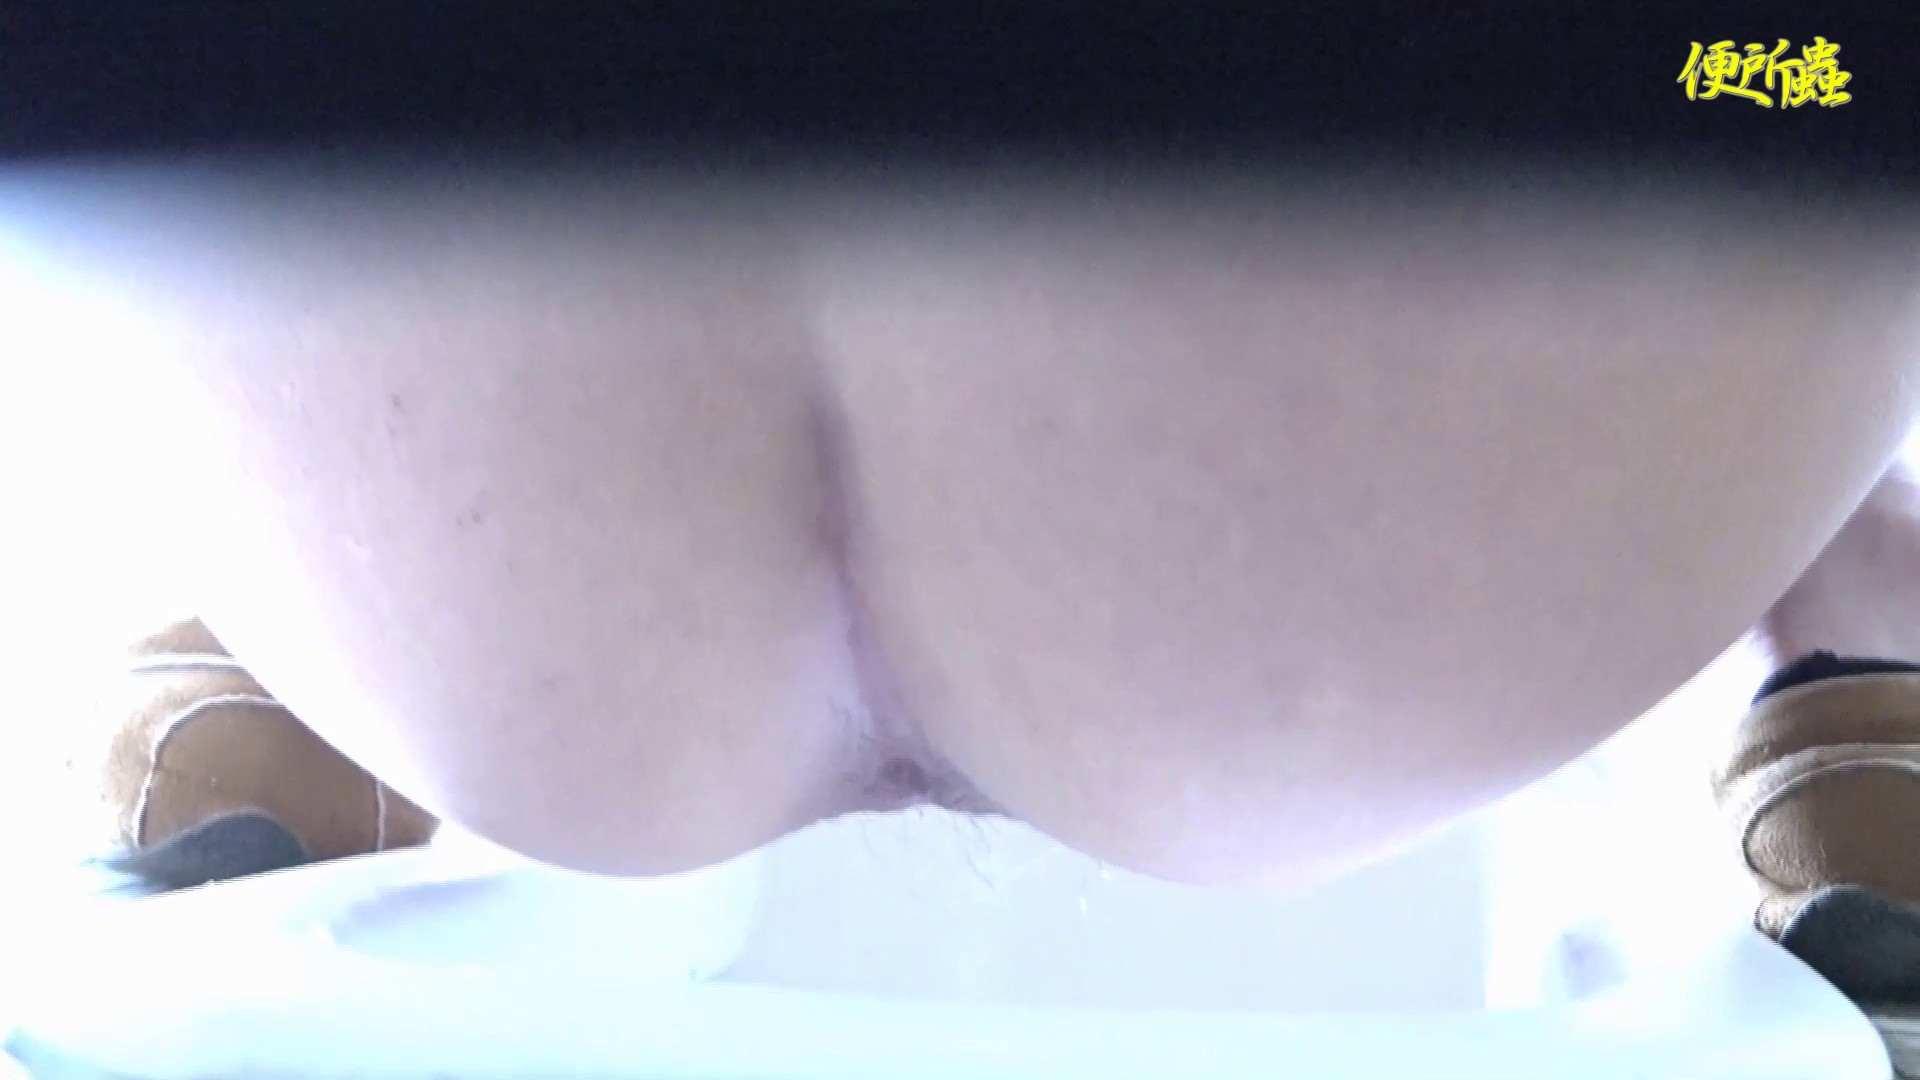 vol.01 便所蟲さんのリターン~便所蟲2匹目~ 洗面所着替え | 盗撮エロすぎ  78連発 50